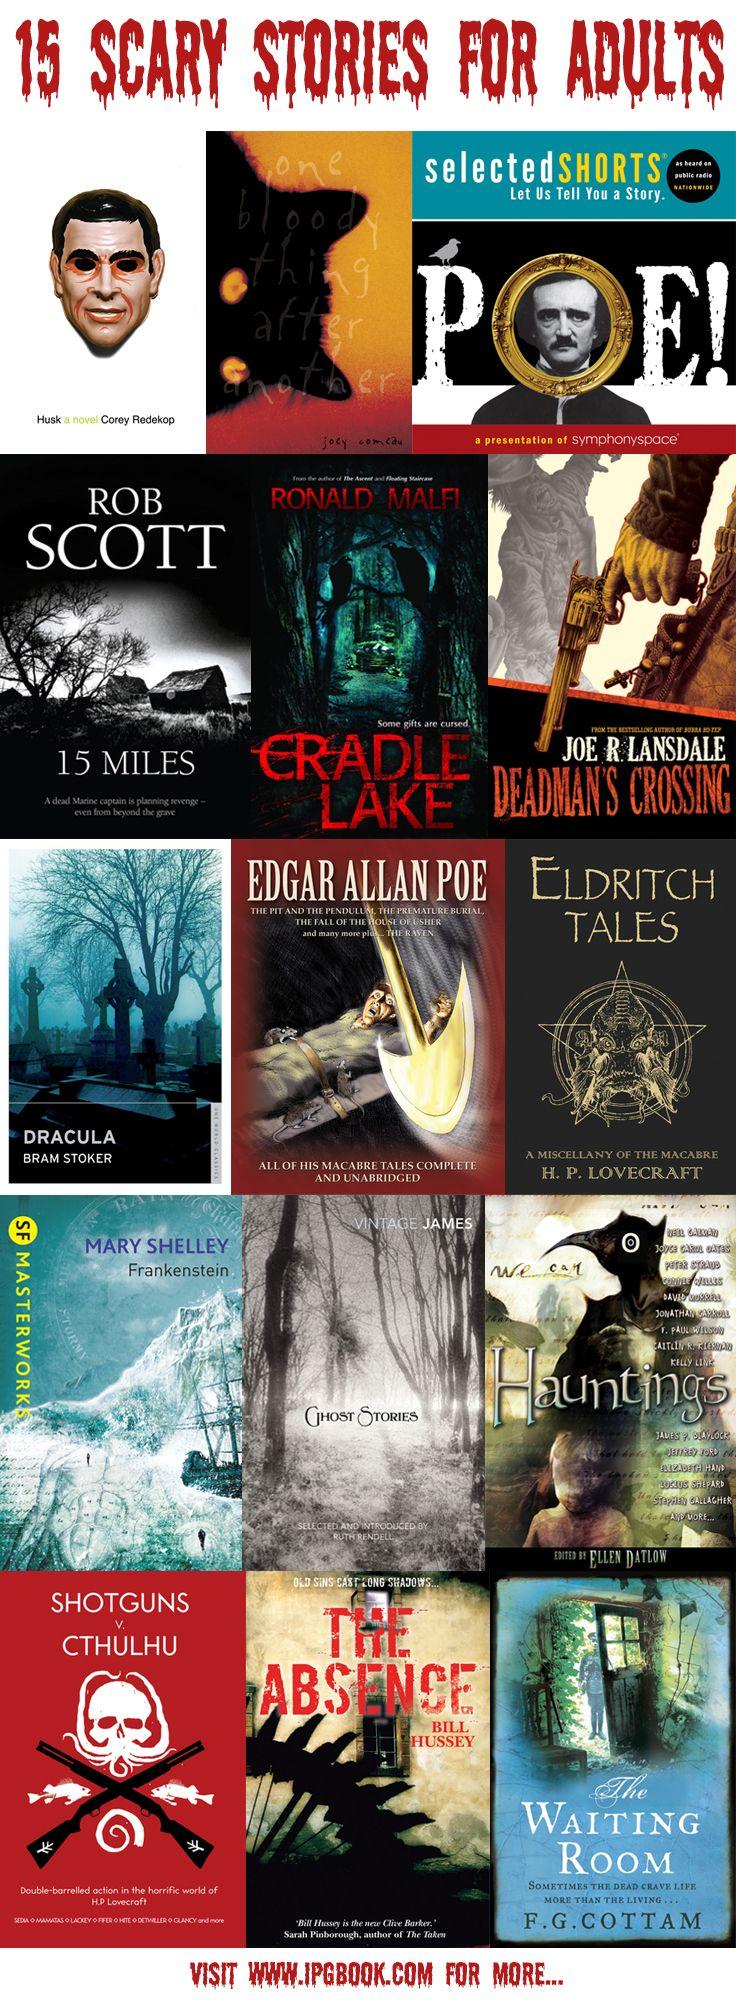 31 Spooky Books to Read This Halloween | EW.com